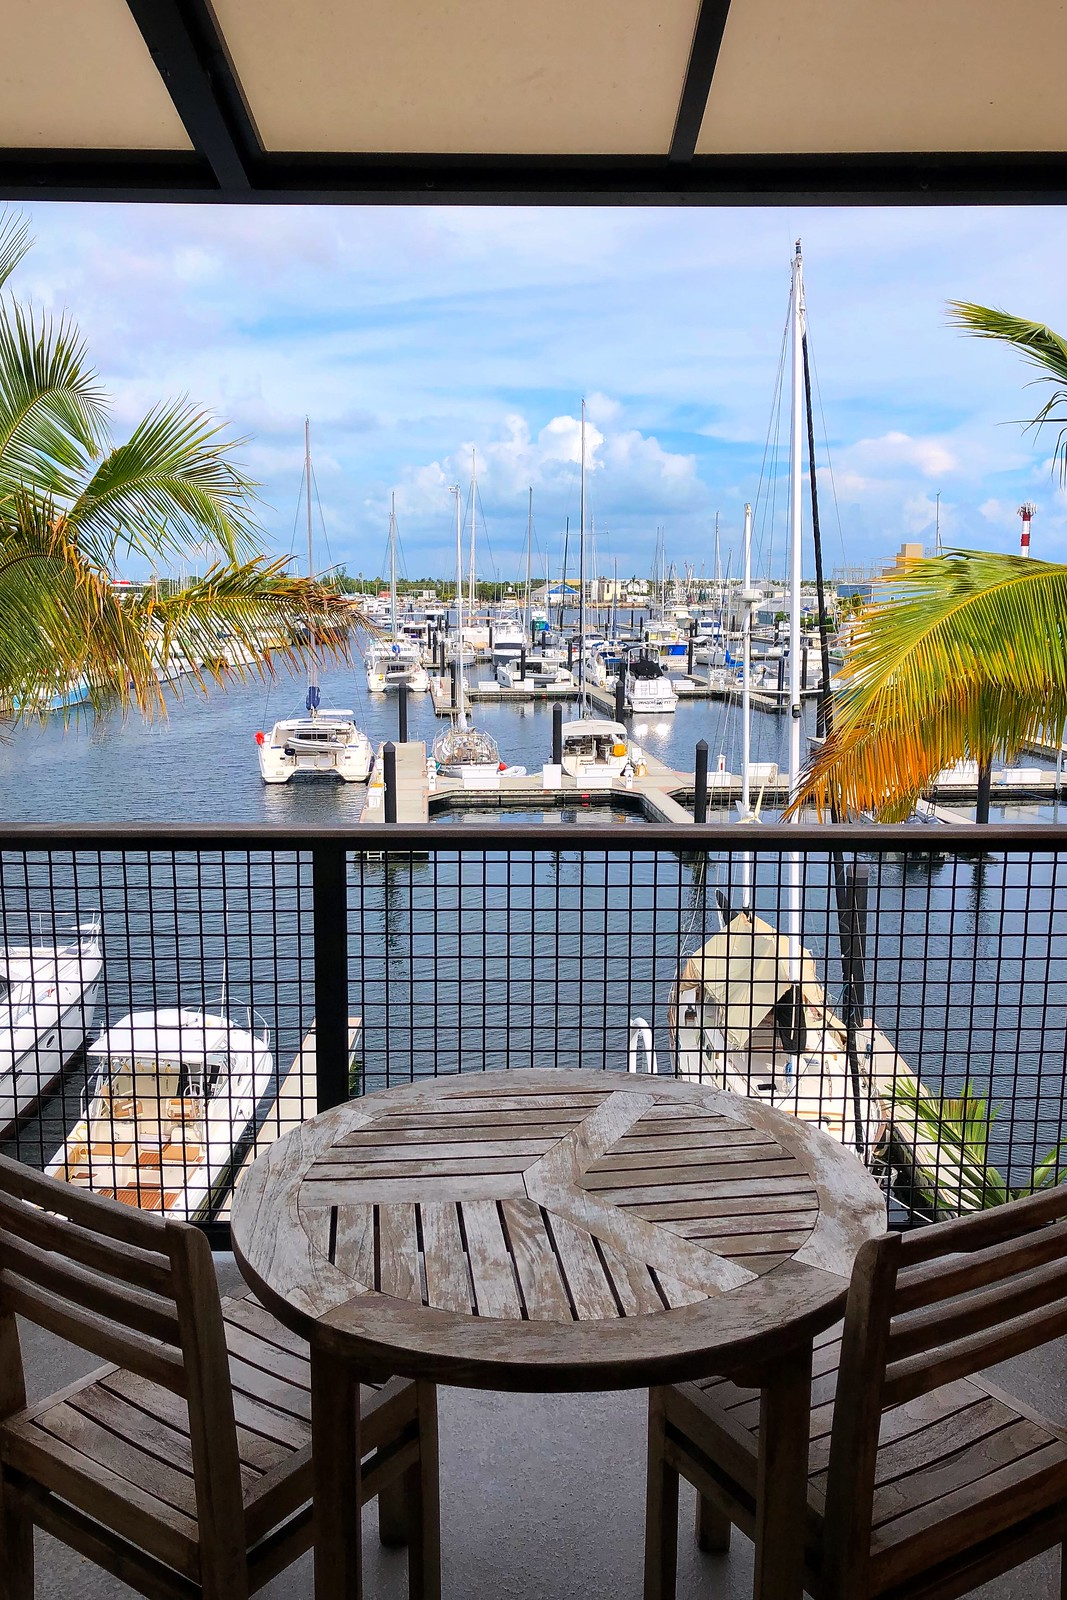 perry-hotel-room-view-stock-island-marina-ultimate-road-trip-5-days-florida-keys-itinerary-what-to-do-key-west-key-largo-islamorada-marathon-miami-vacation-guide